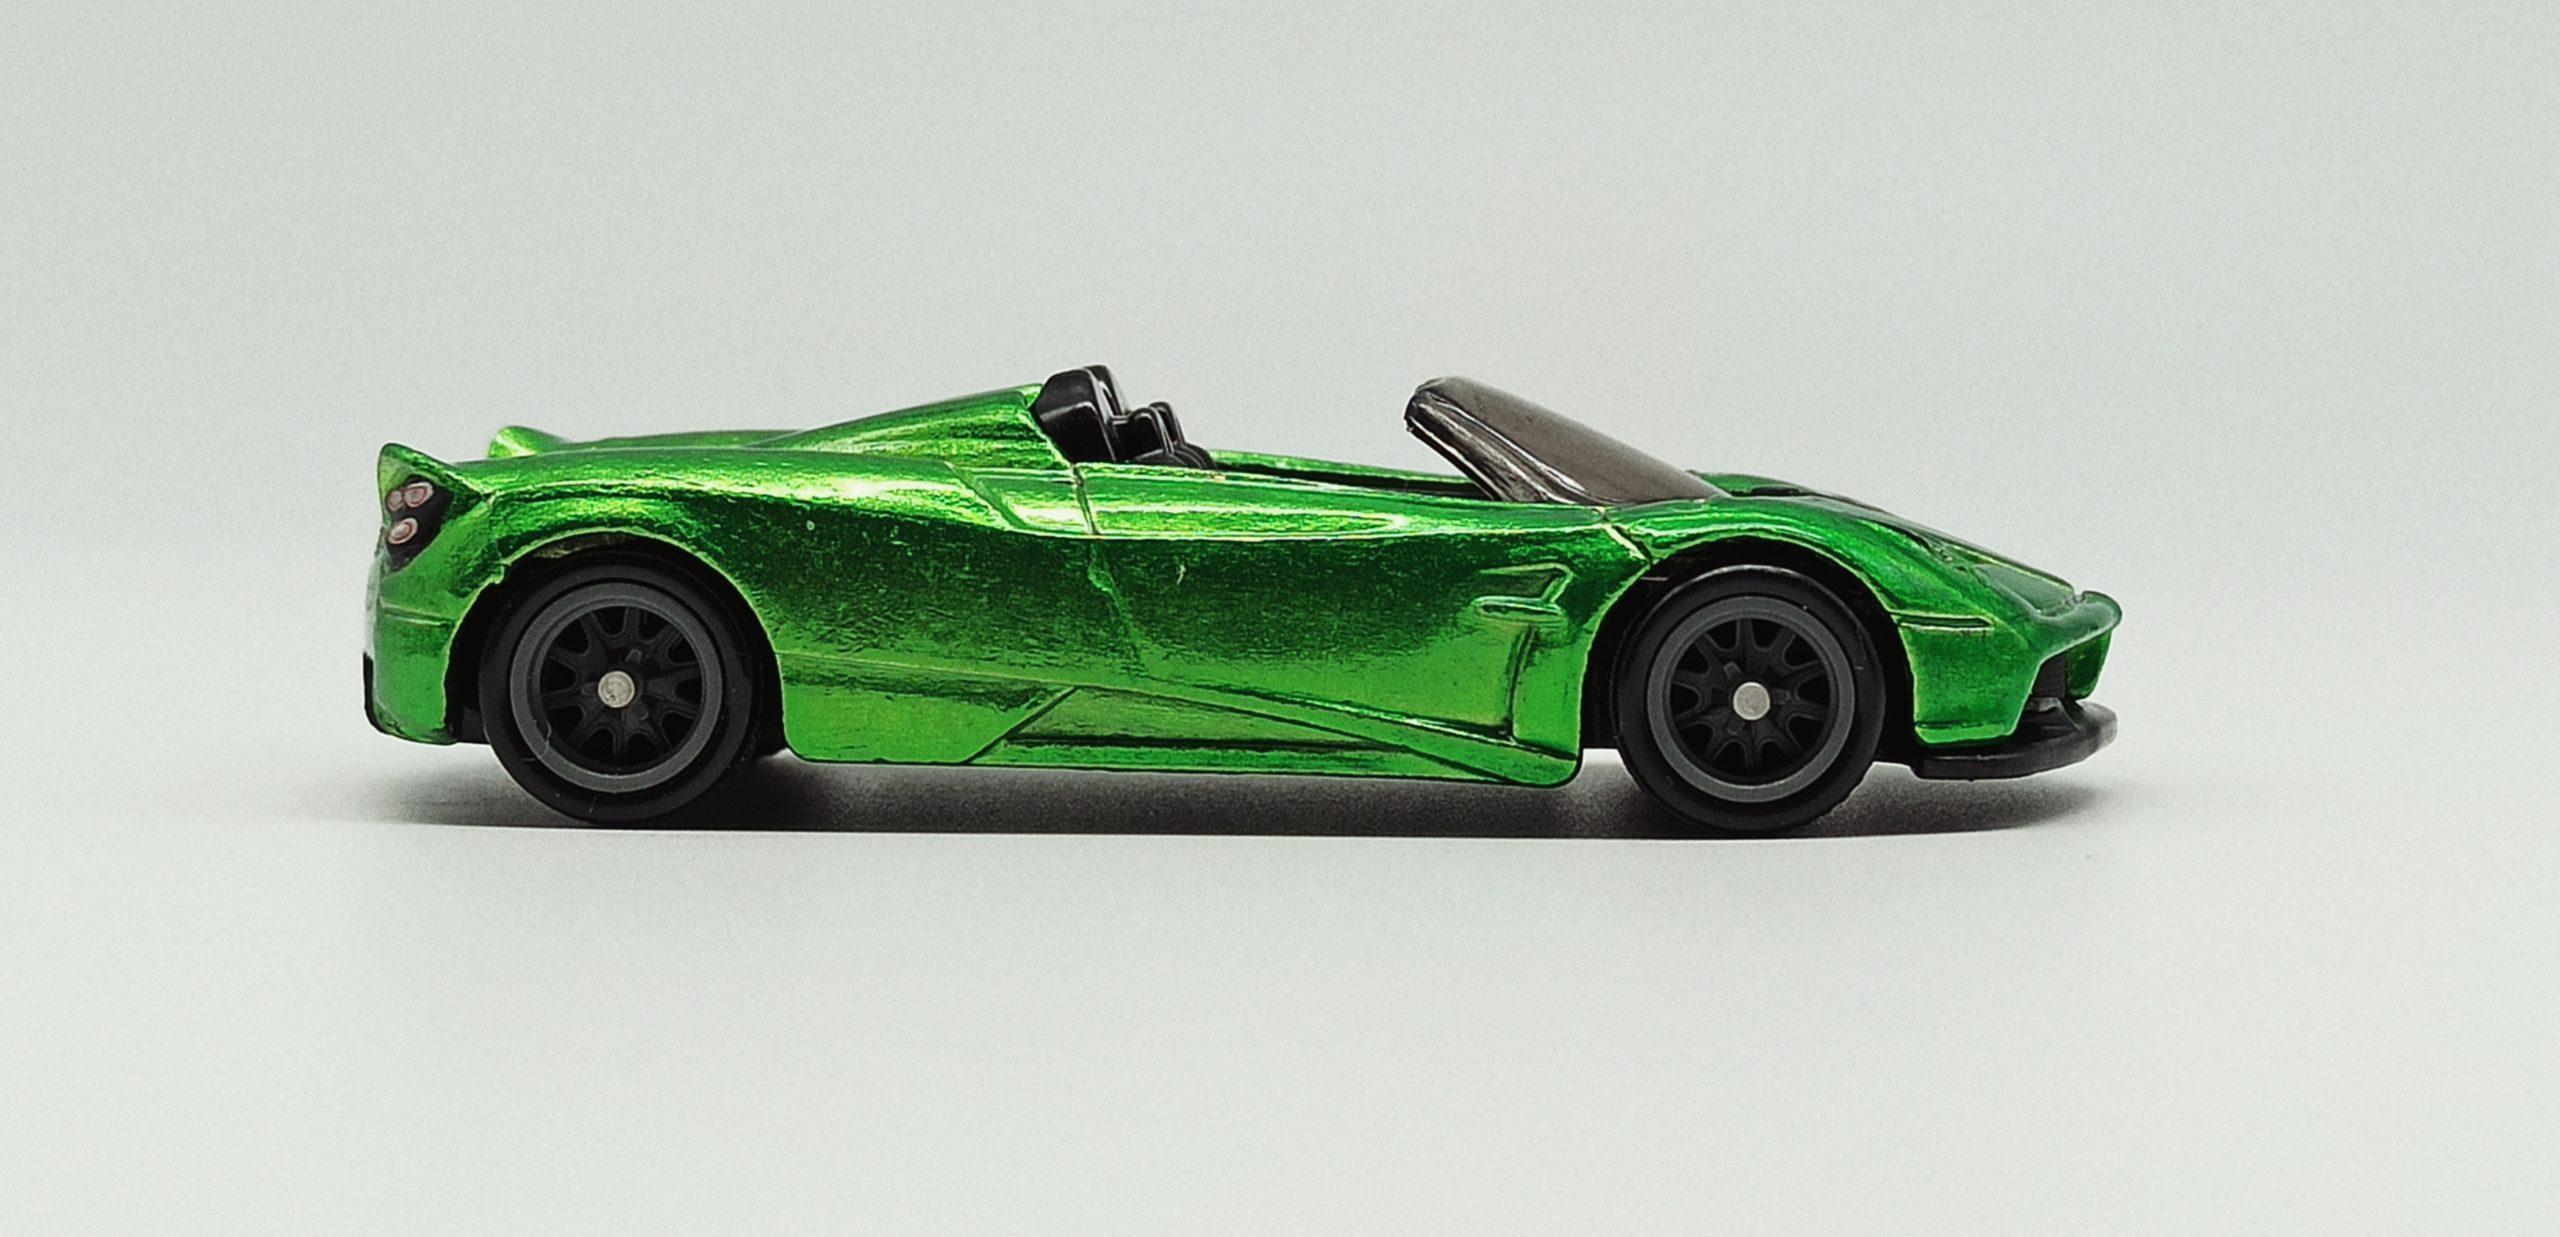 Hot Wheels '17 Pagani Huayra Roadster (GHG21) 2020 (241/250) HW Roadsters (5/5) spectraflame green Super Treasure Hunt (STH) side